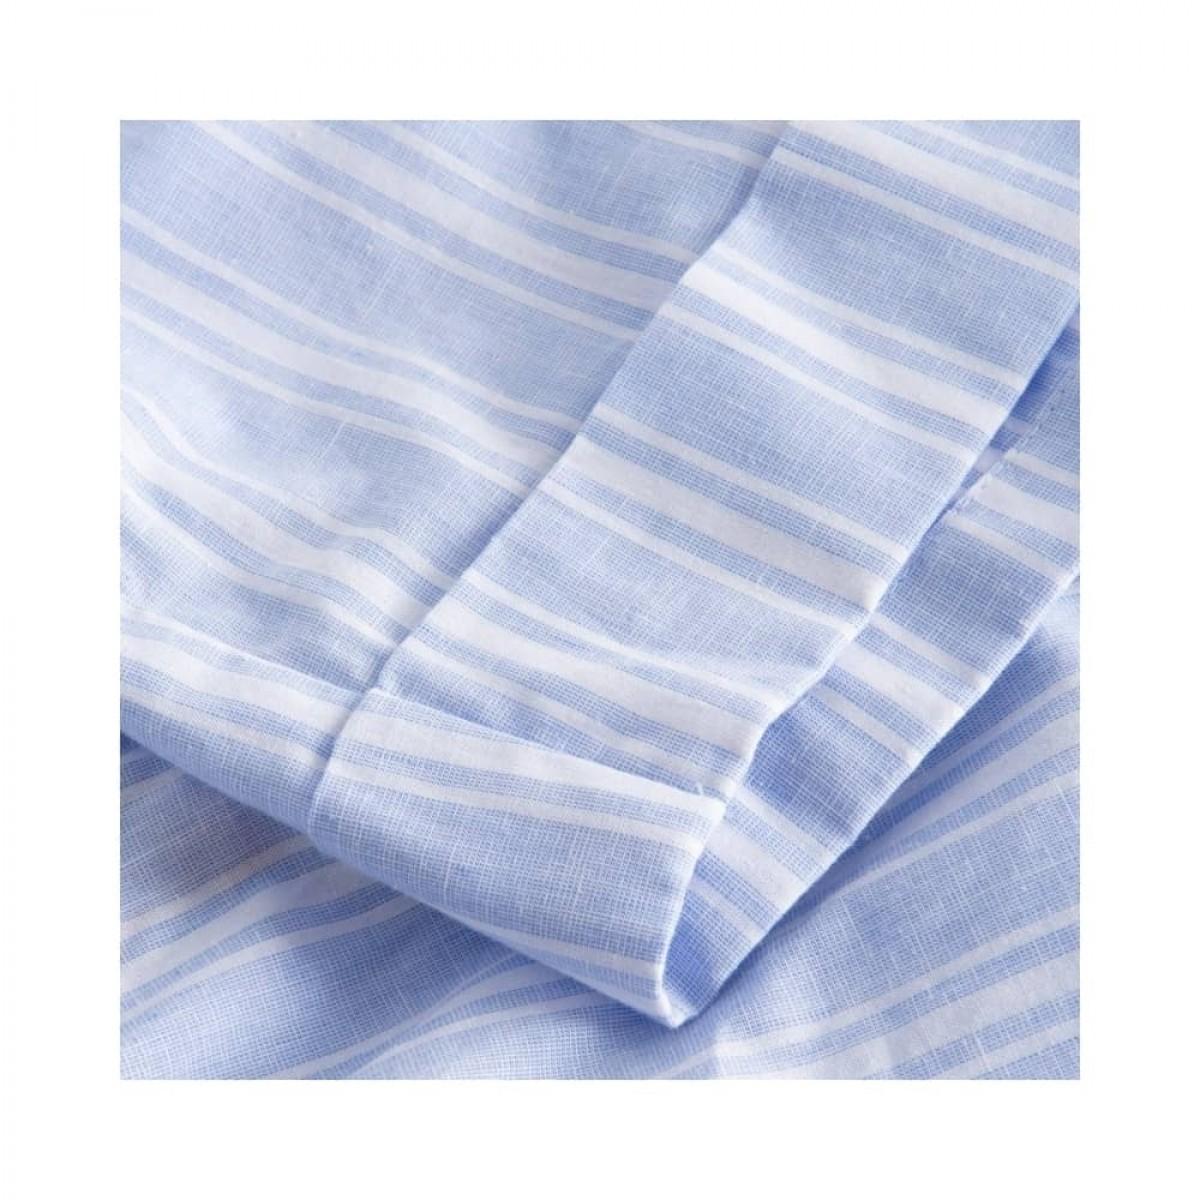 peony shorts - blue/white stripe - afslutning ved ben